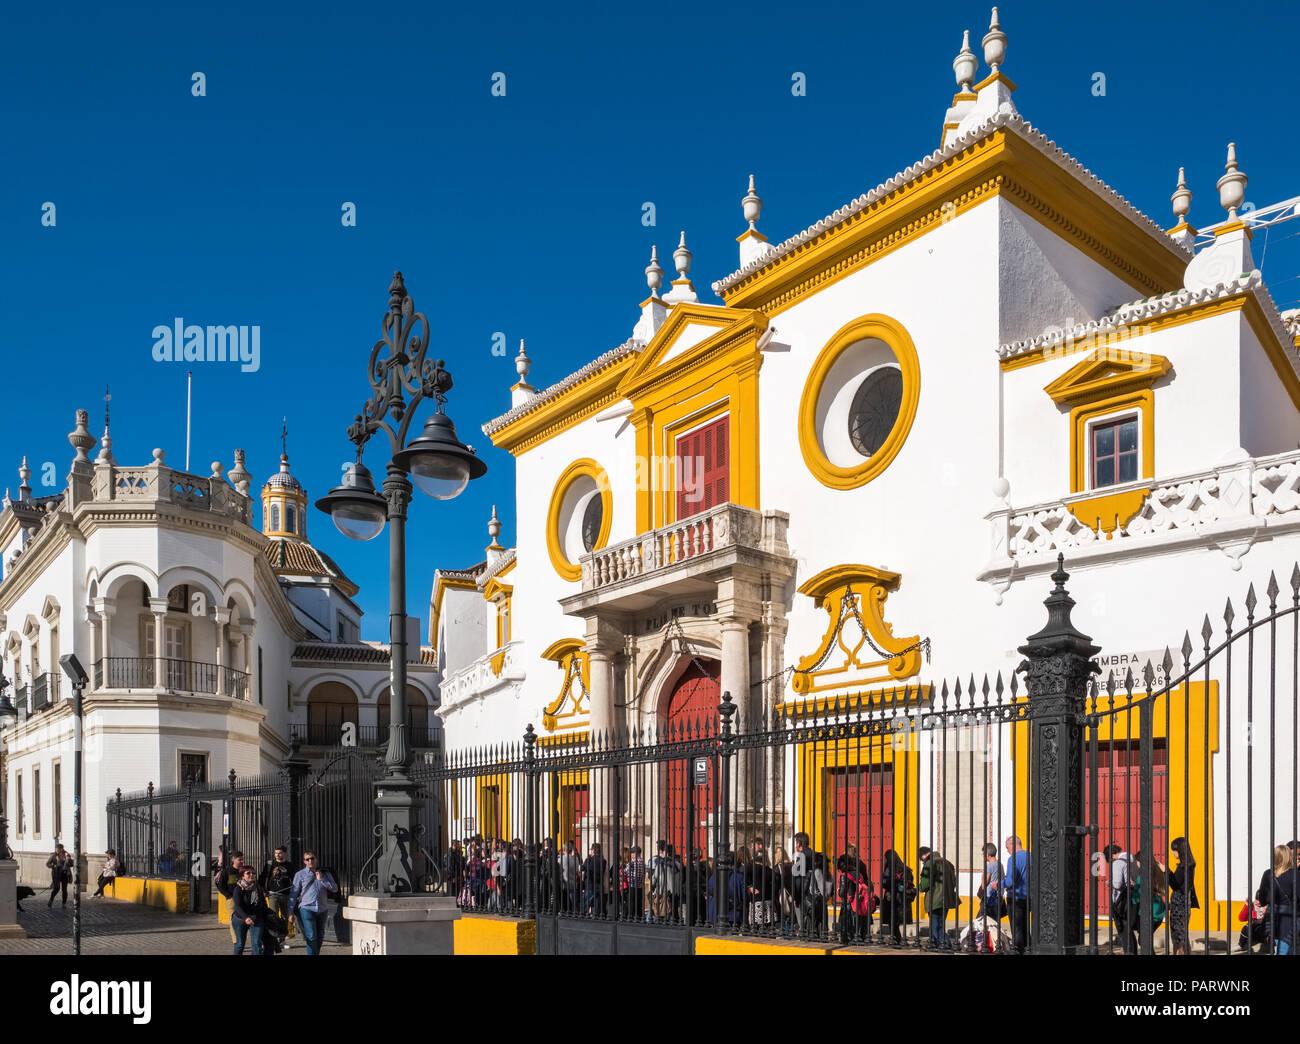 Maestranza, the Plaza de Toros de la Real Maestranza de Caballeria de Sevilla, Seville, Spain, Europe - bullring - Stock Image